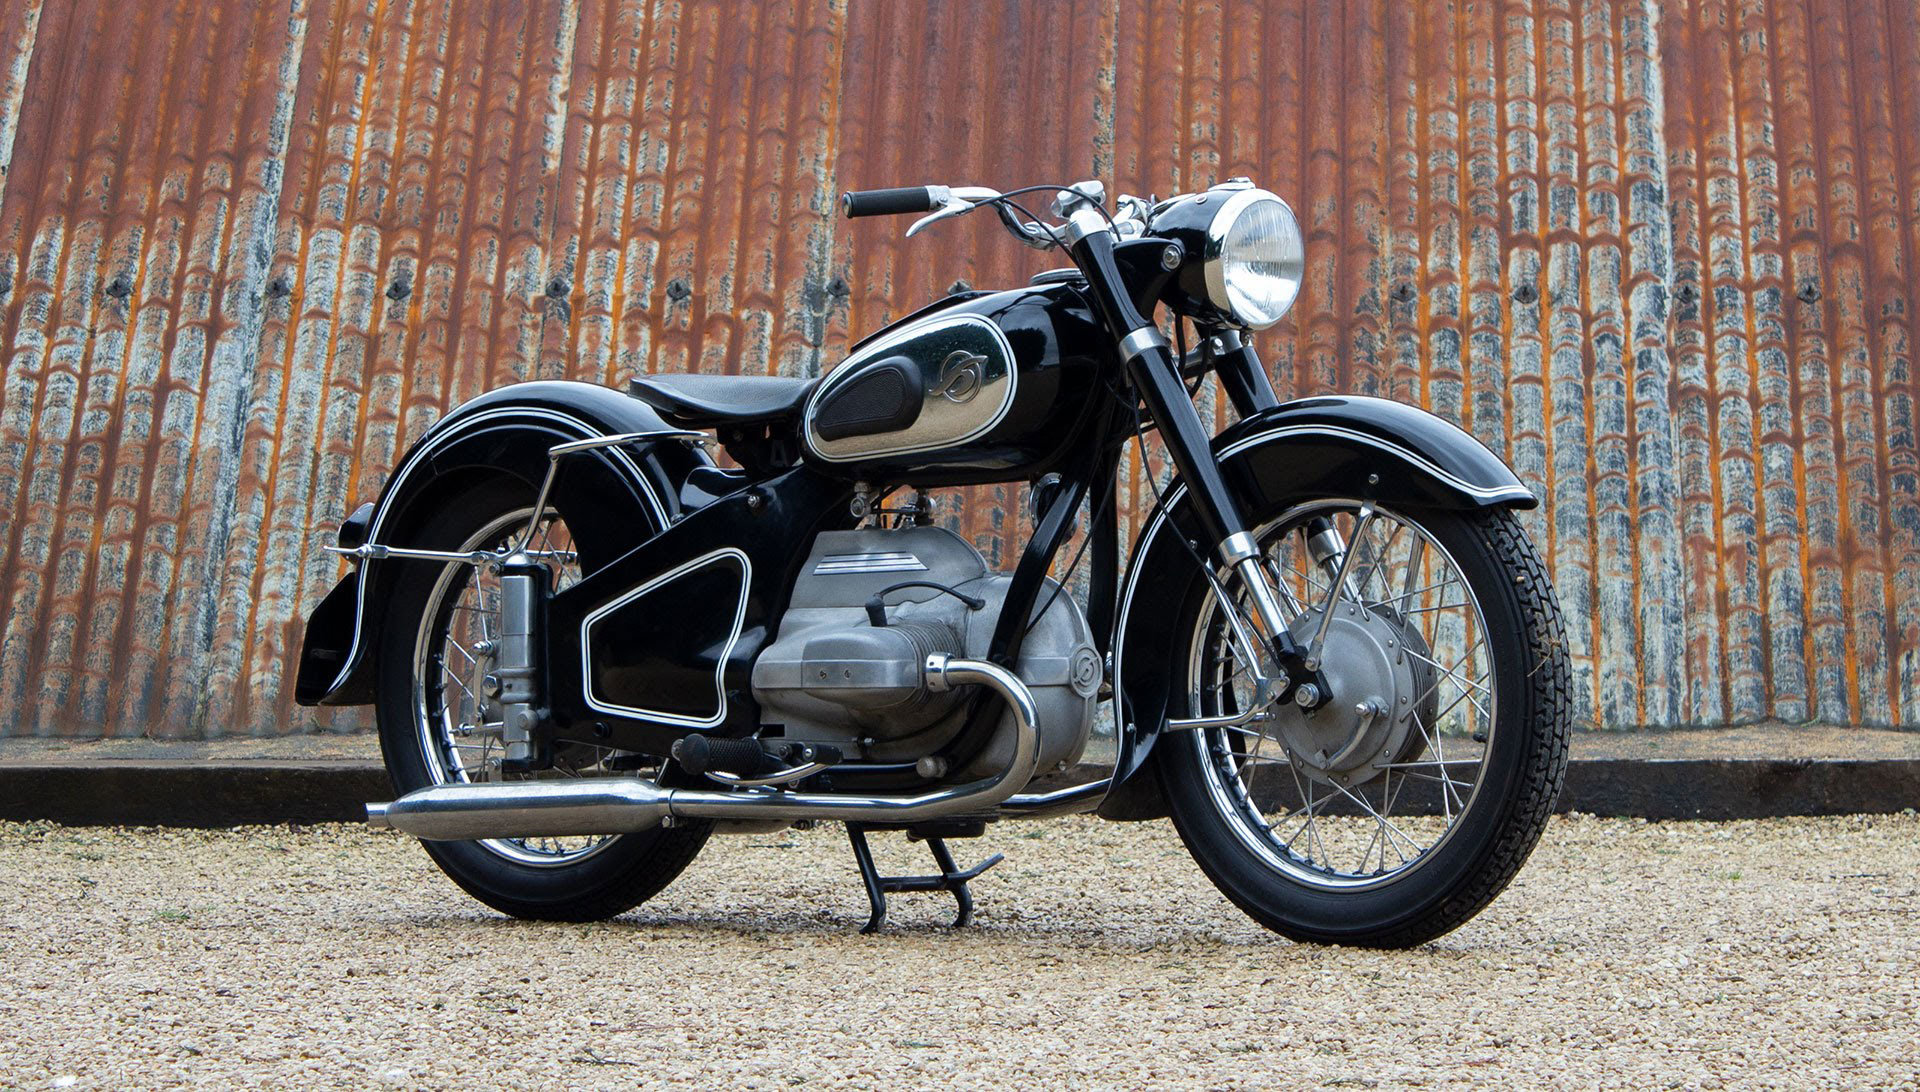 1952 Hoffmann Gouverneur 250cc - ex-Sammy Miller For Sale (picture 1 of 6)